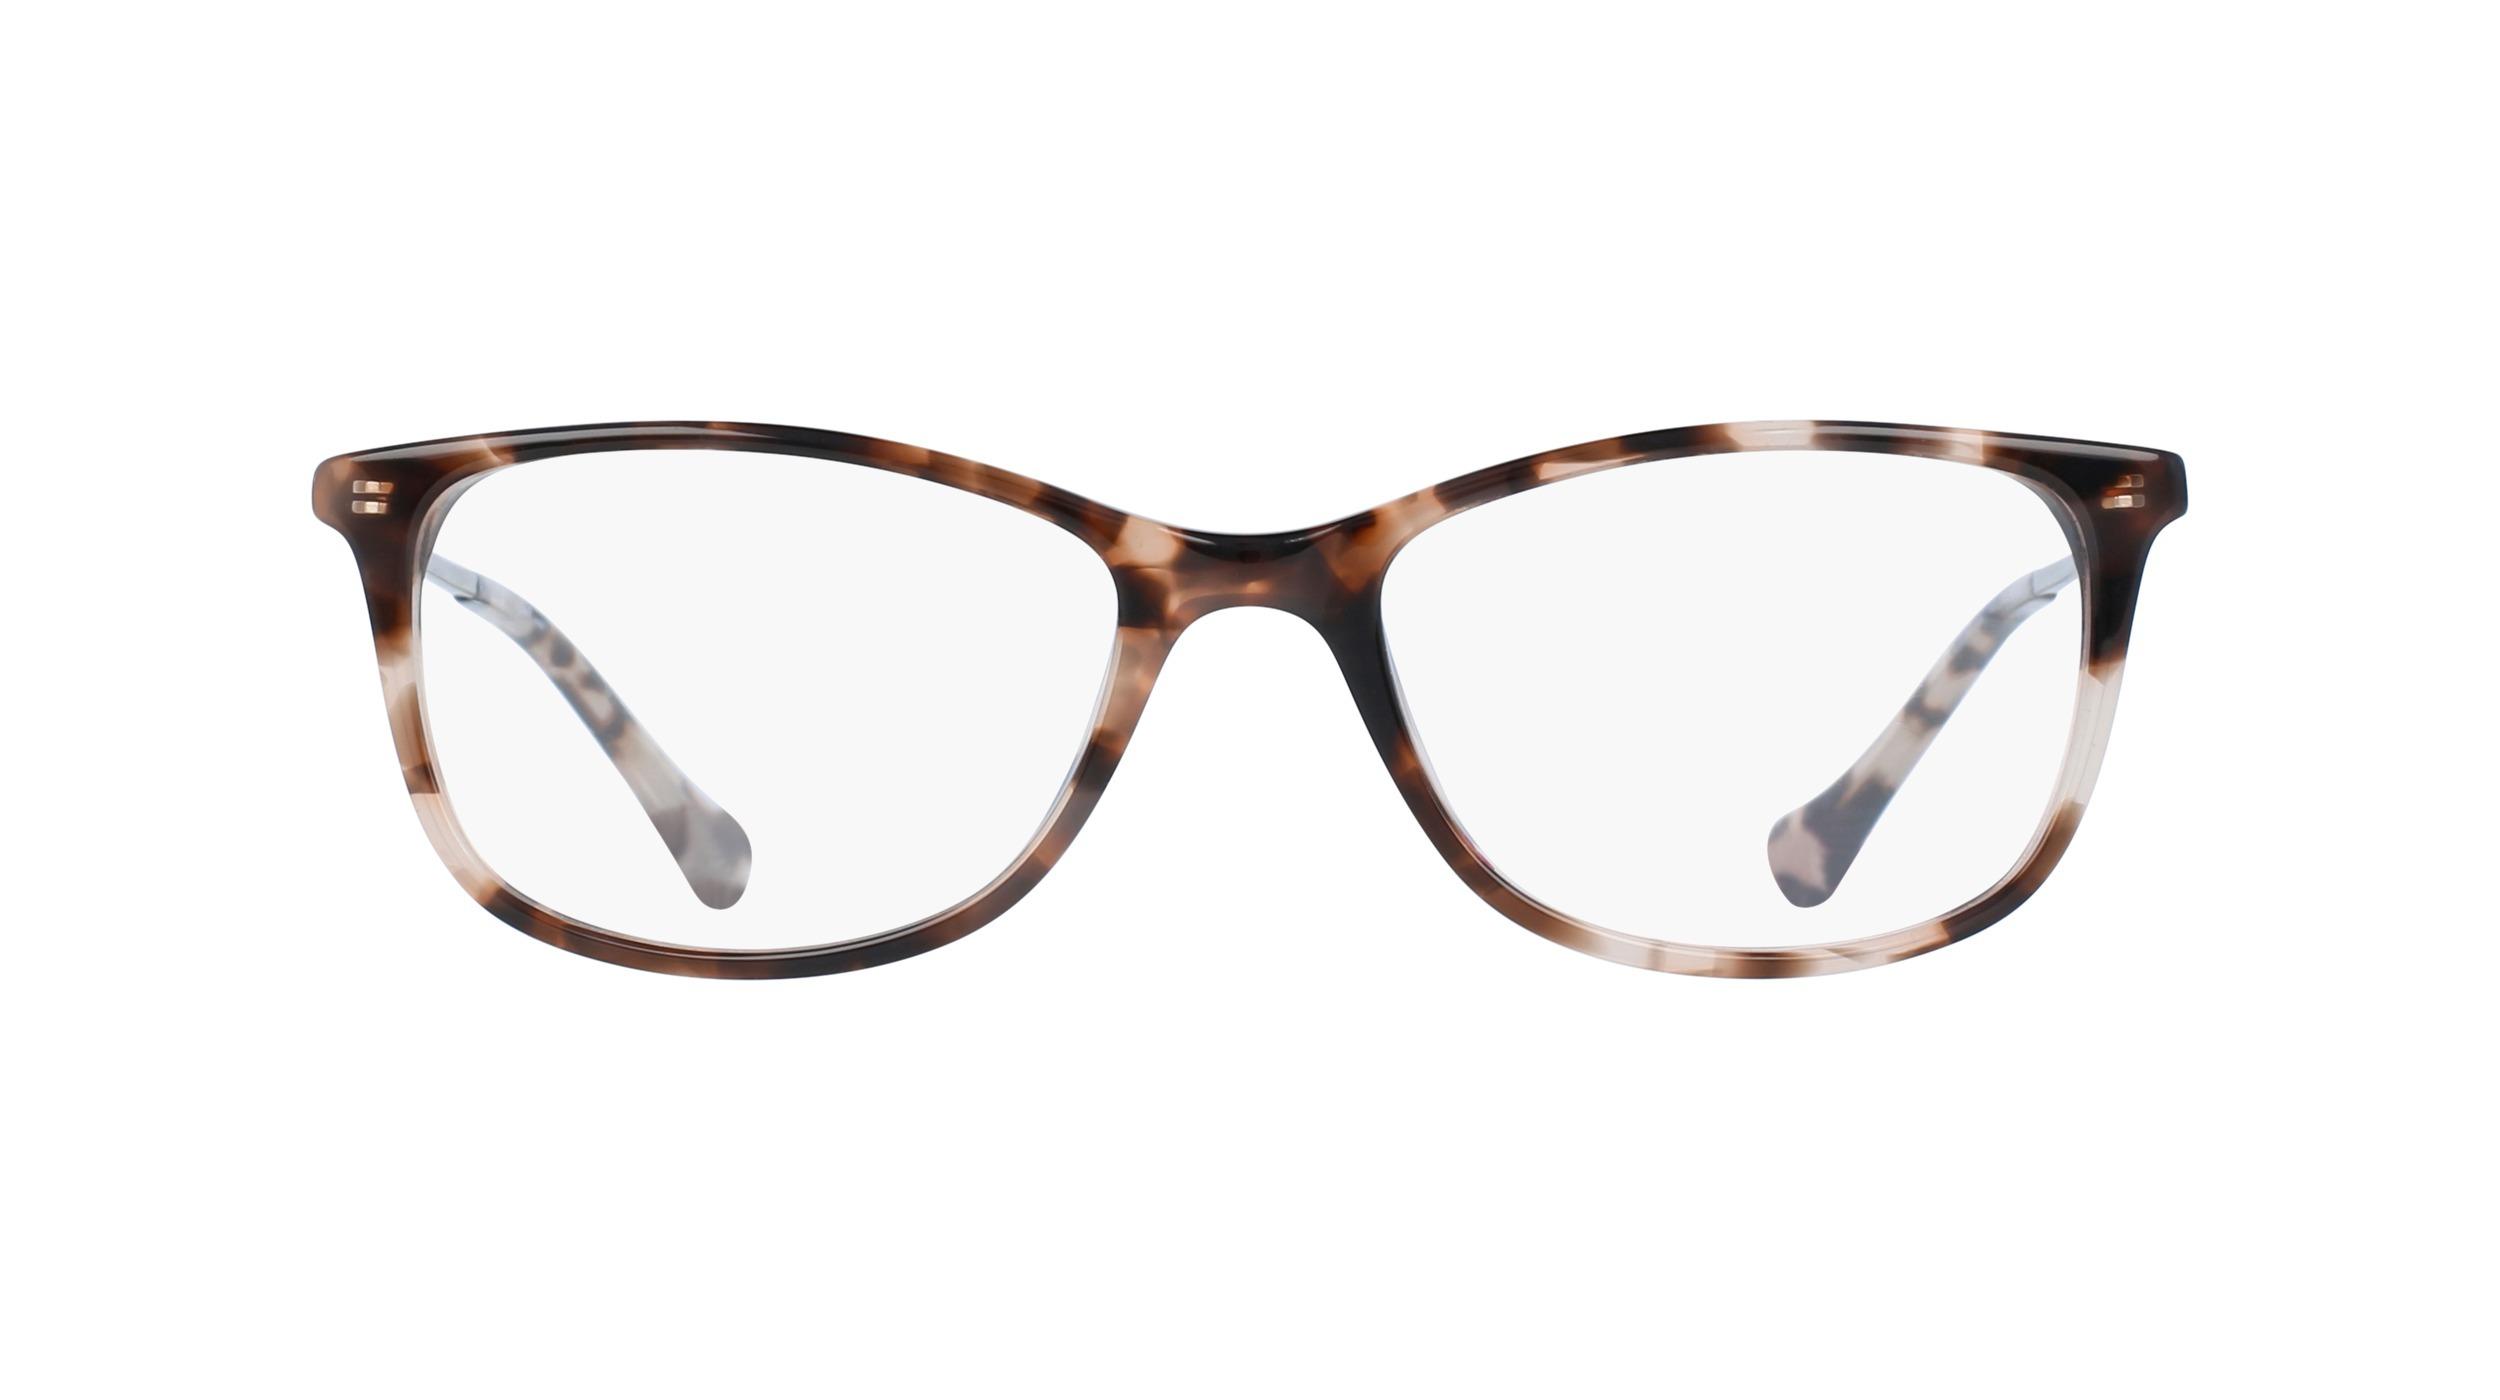 optic2000-lunettes-soleil-ripcurl